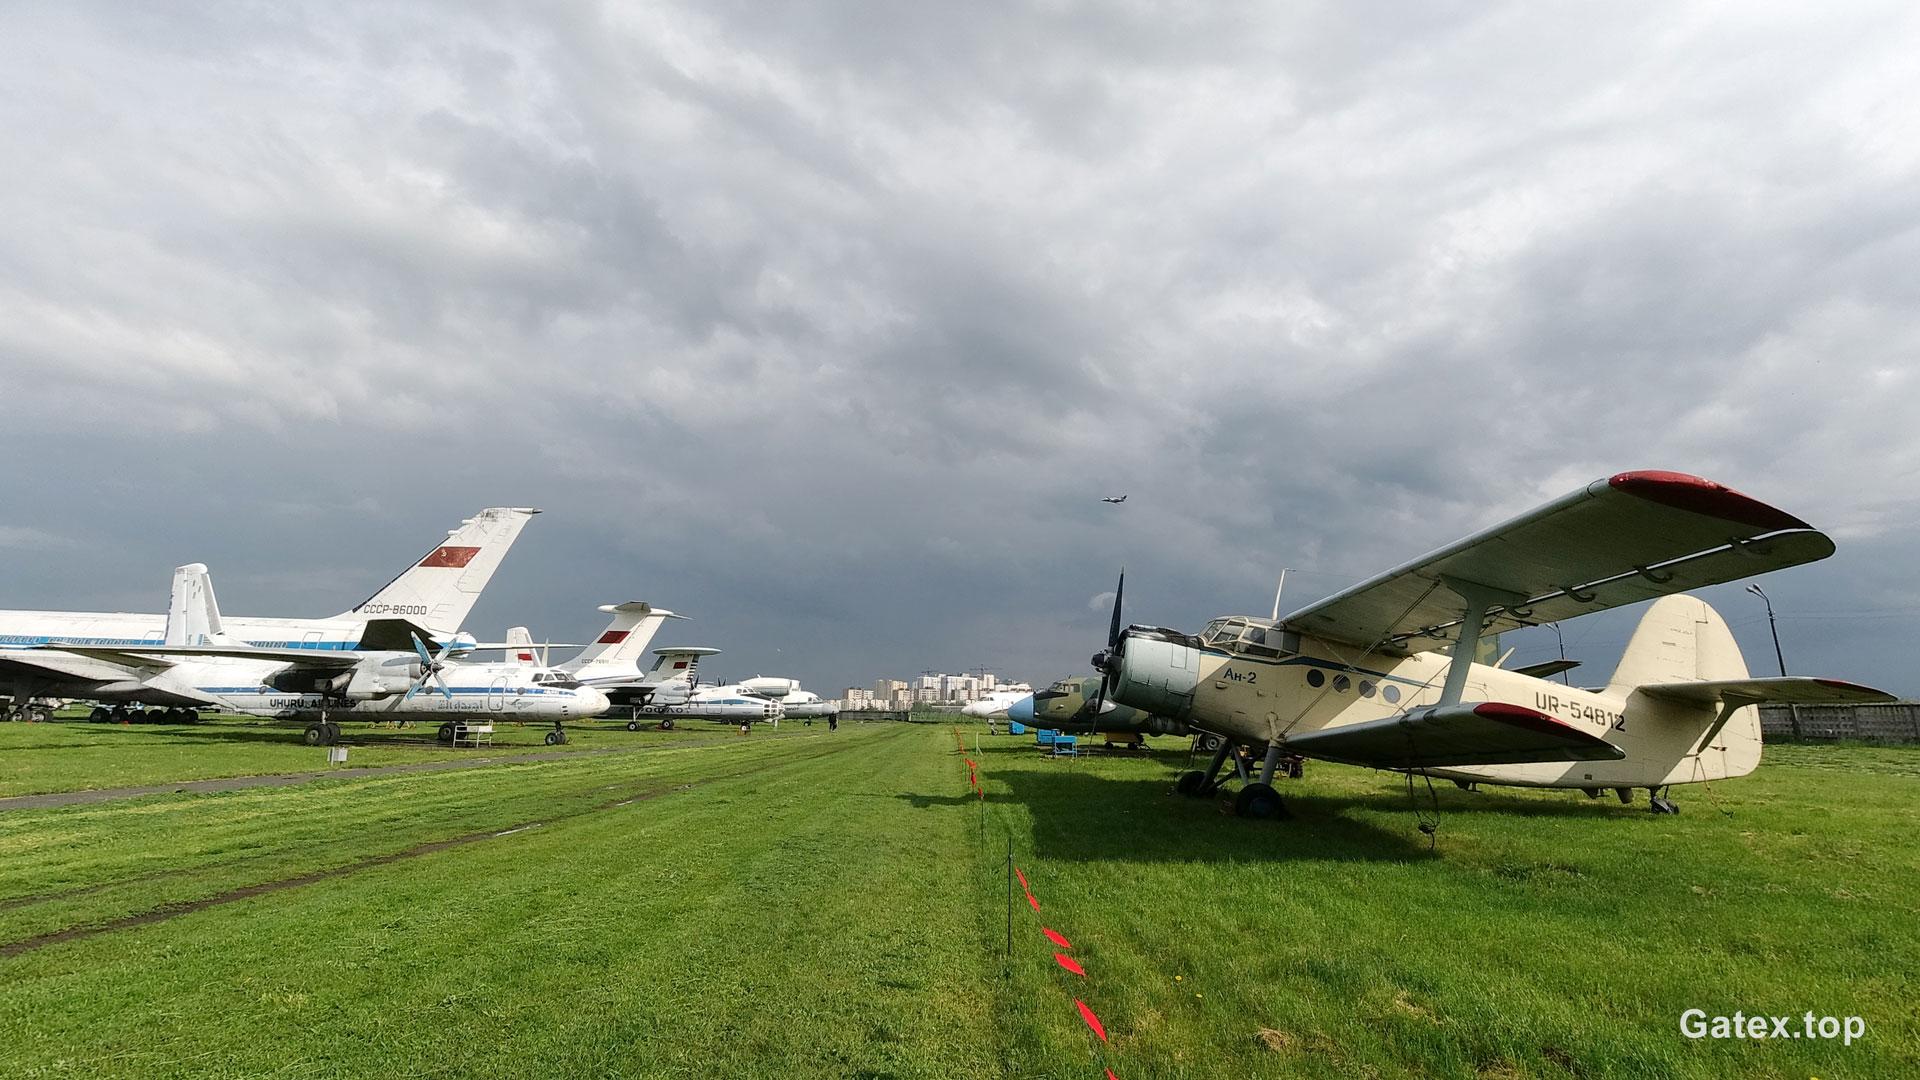 avia-museum-gatex